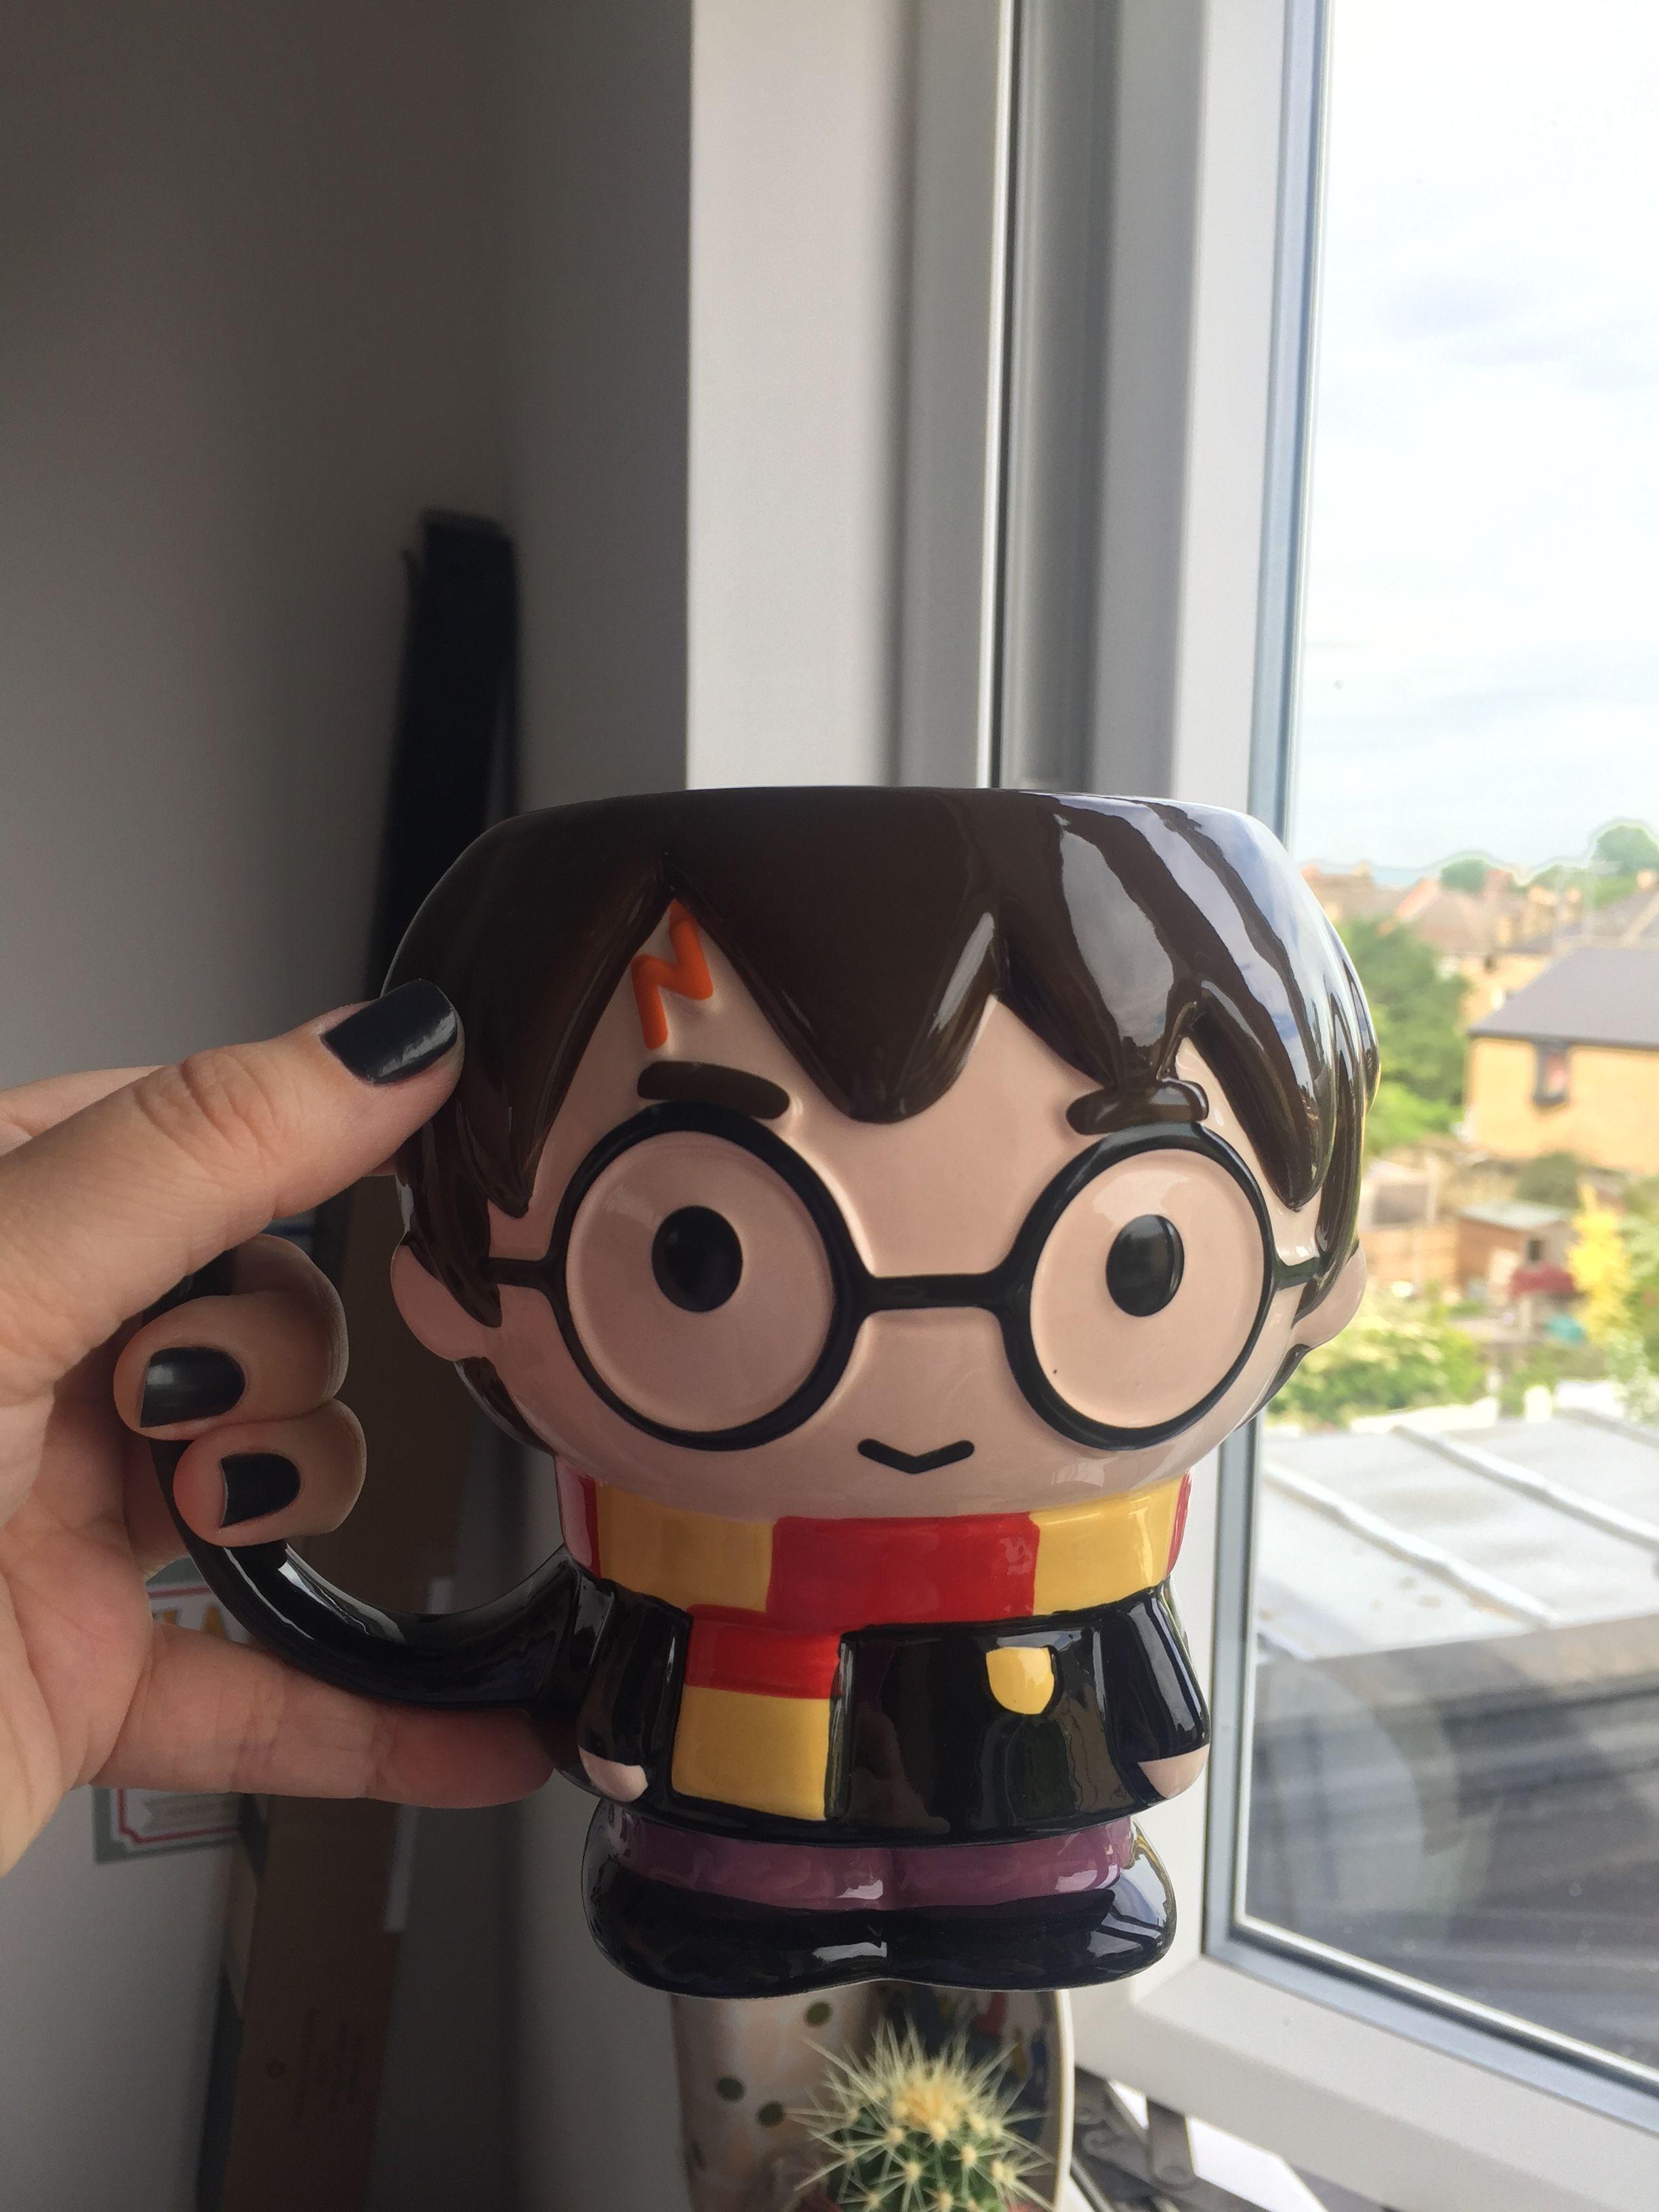 Details about bn in box harry potter large ceramic mug